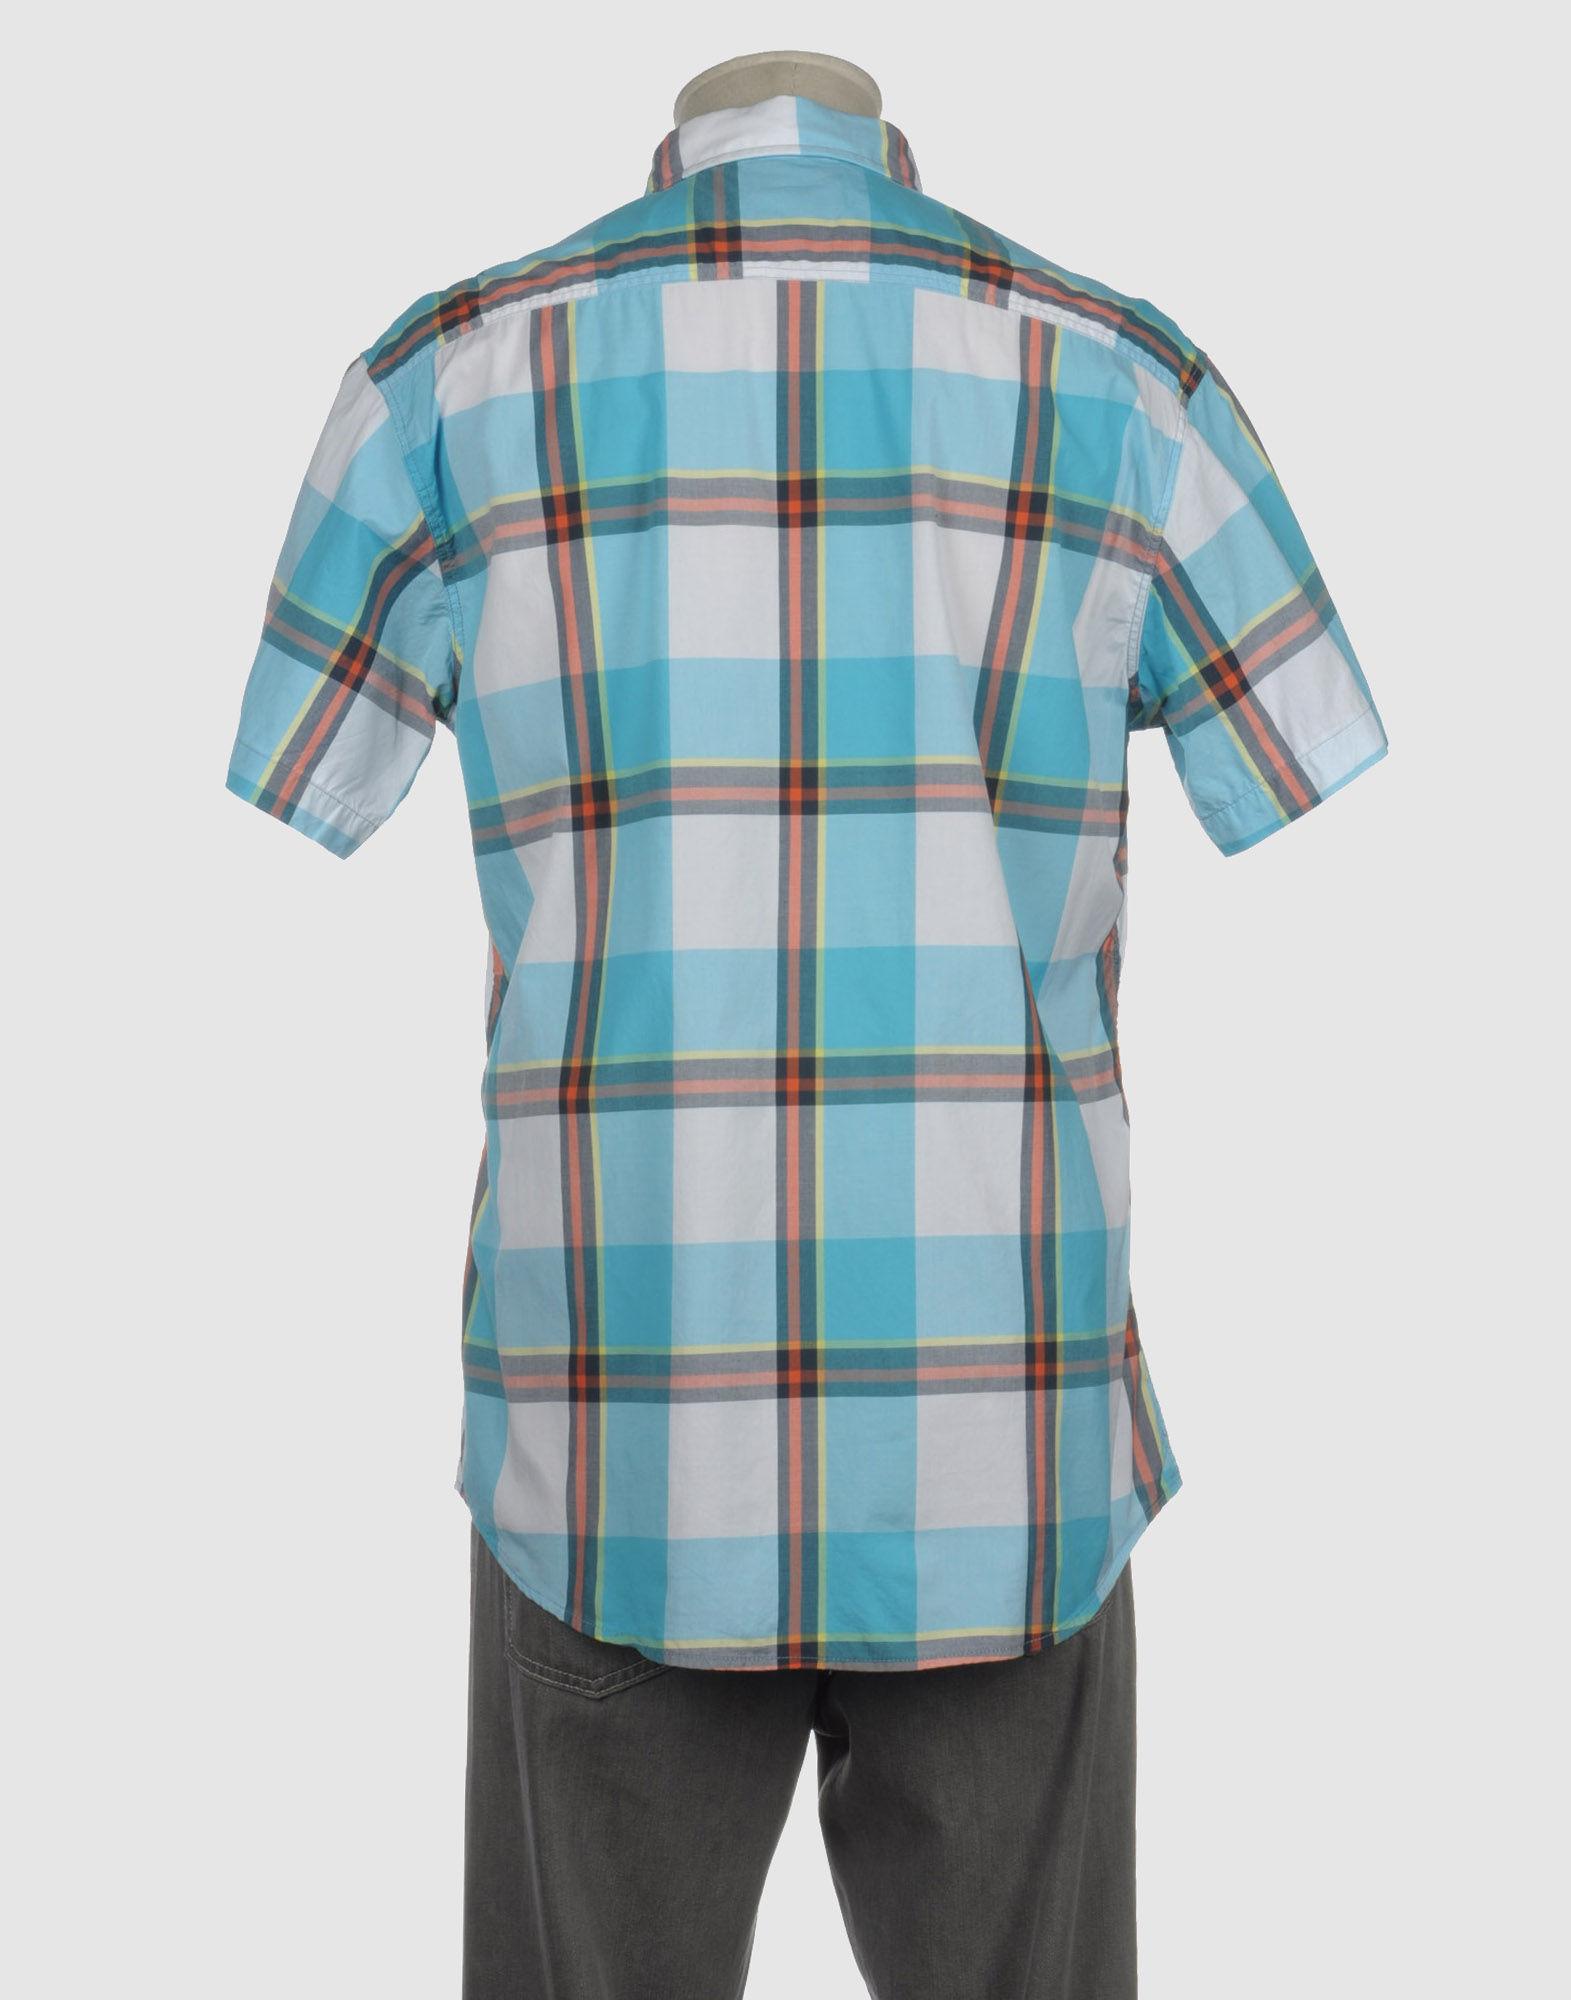 Lyst Franklin Marshall Short Sleeve Shirt In Blue For Men